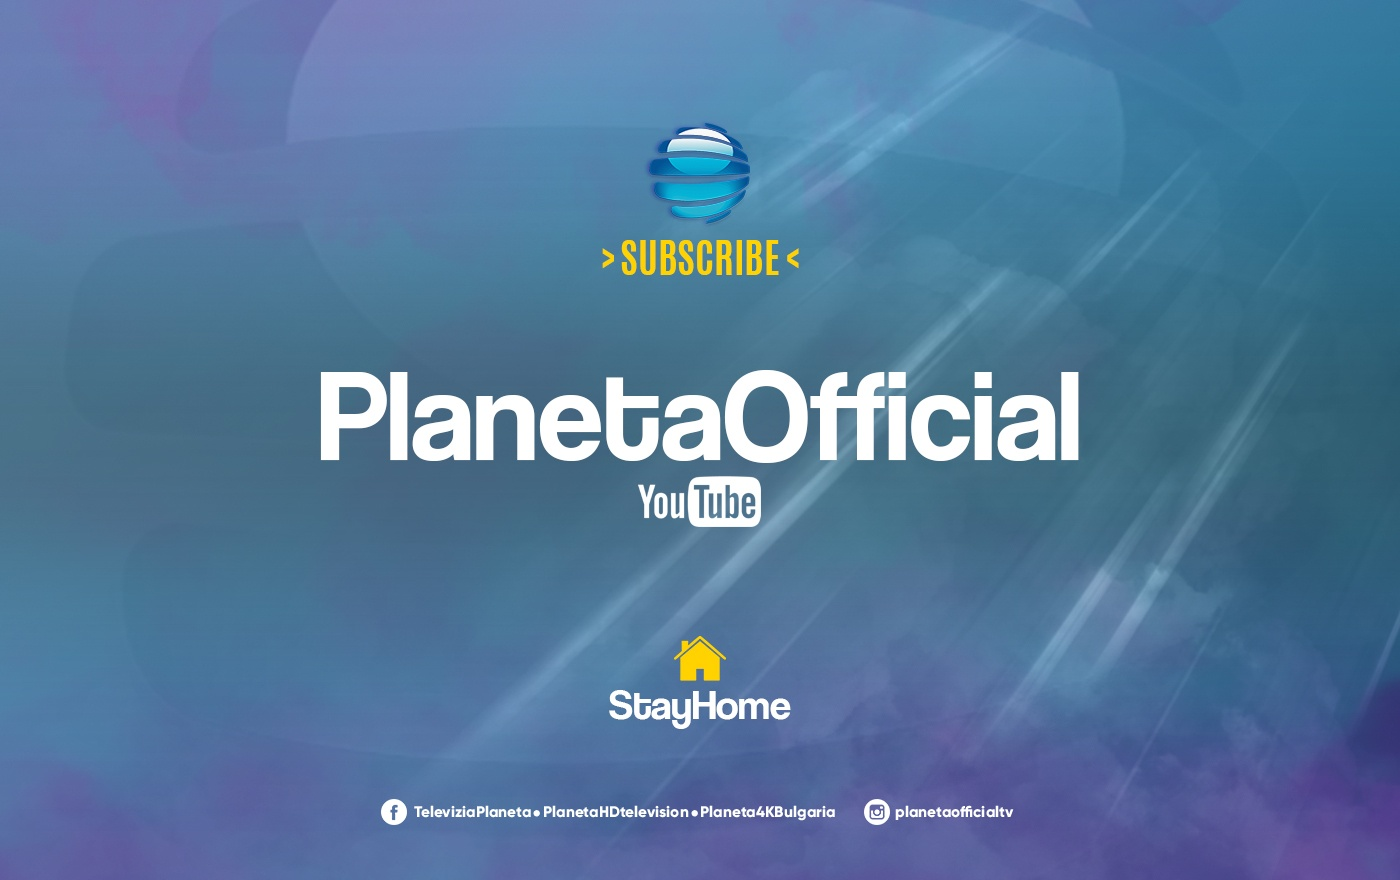 26 000 нови абонати в PlanetaOfficial през март